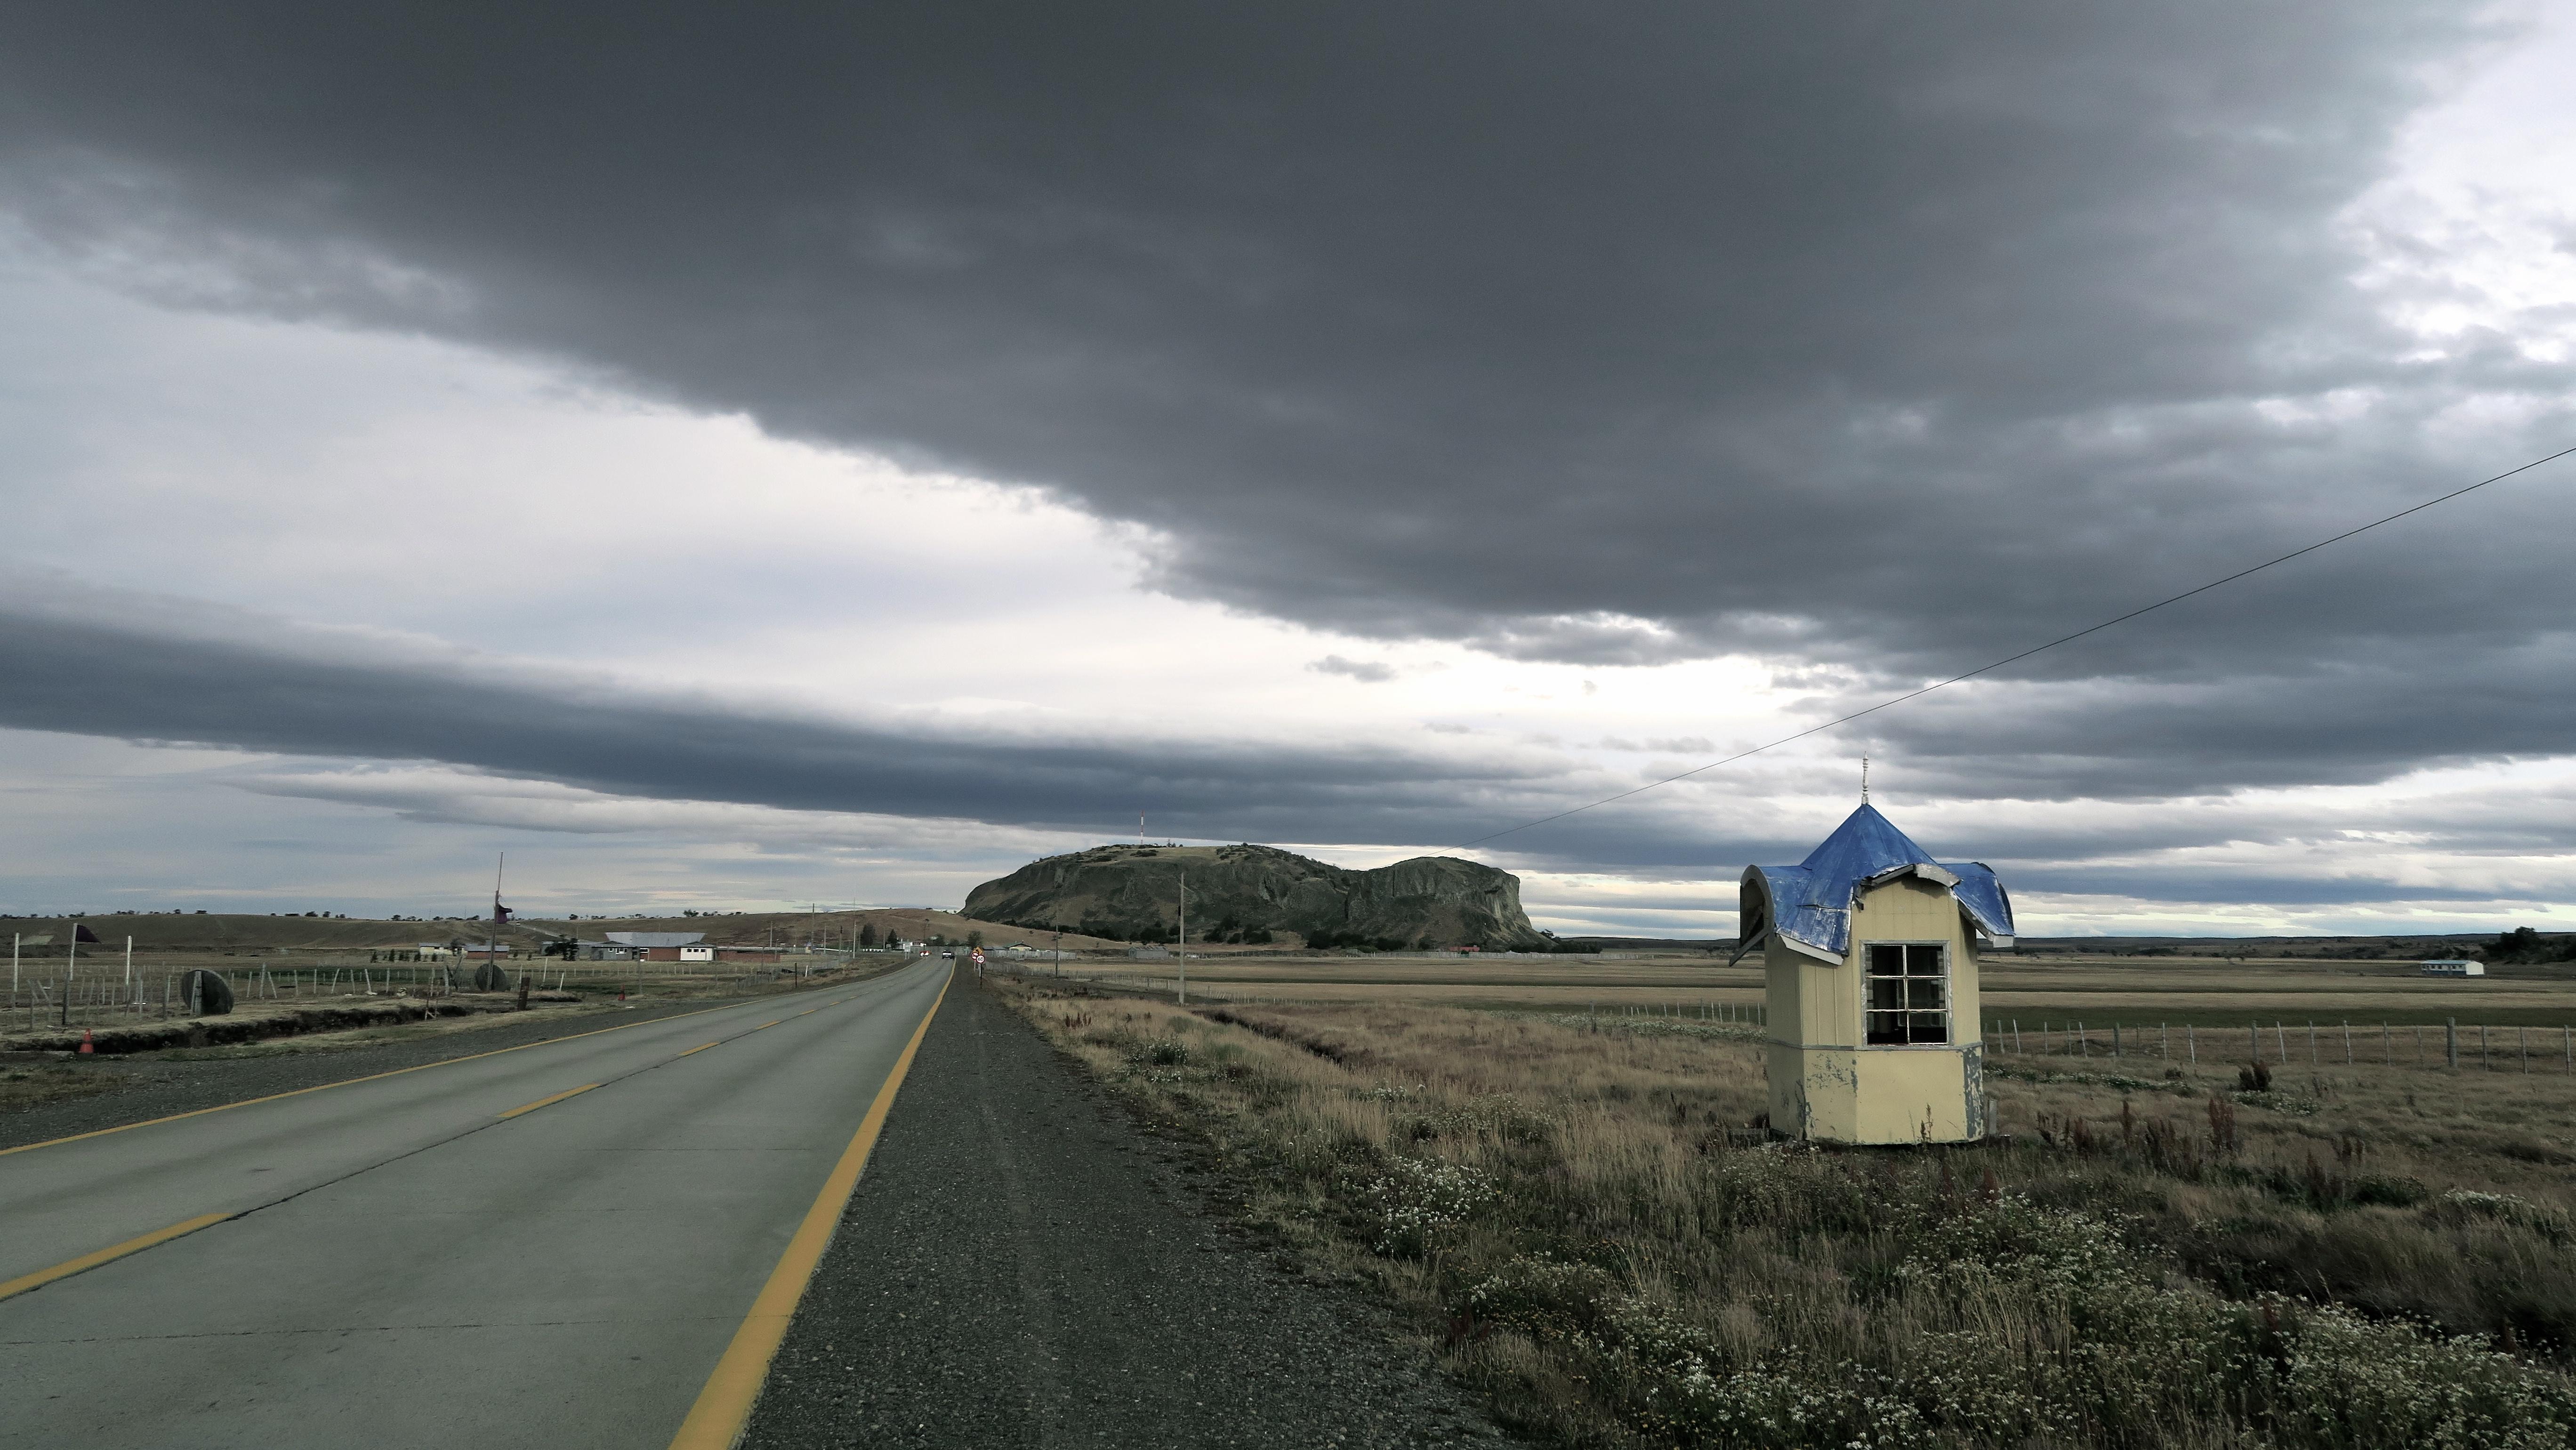 Day 19: Feb 22, Puerto Natales – Morro Chico, 101km